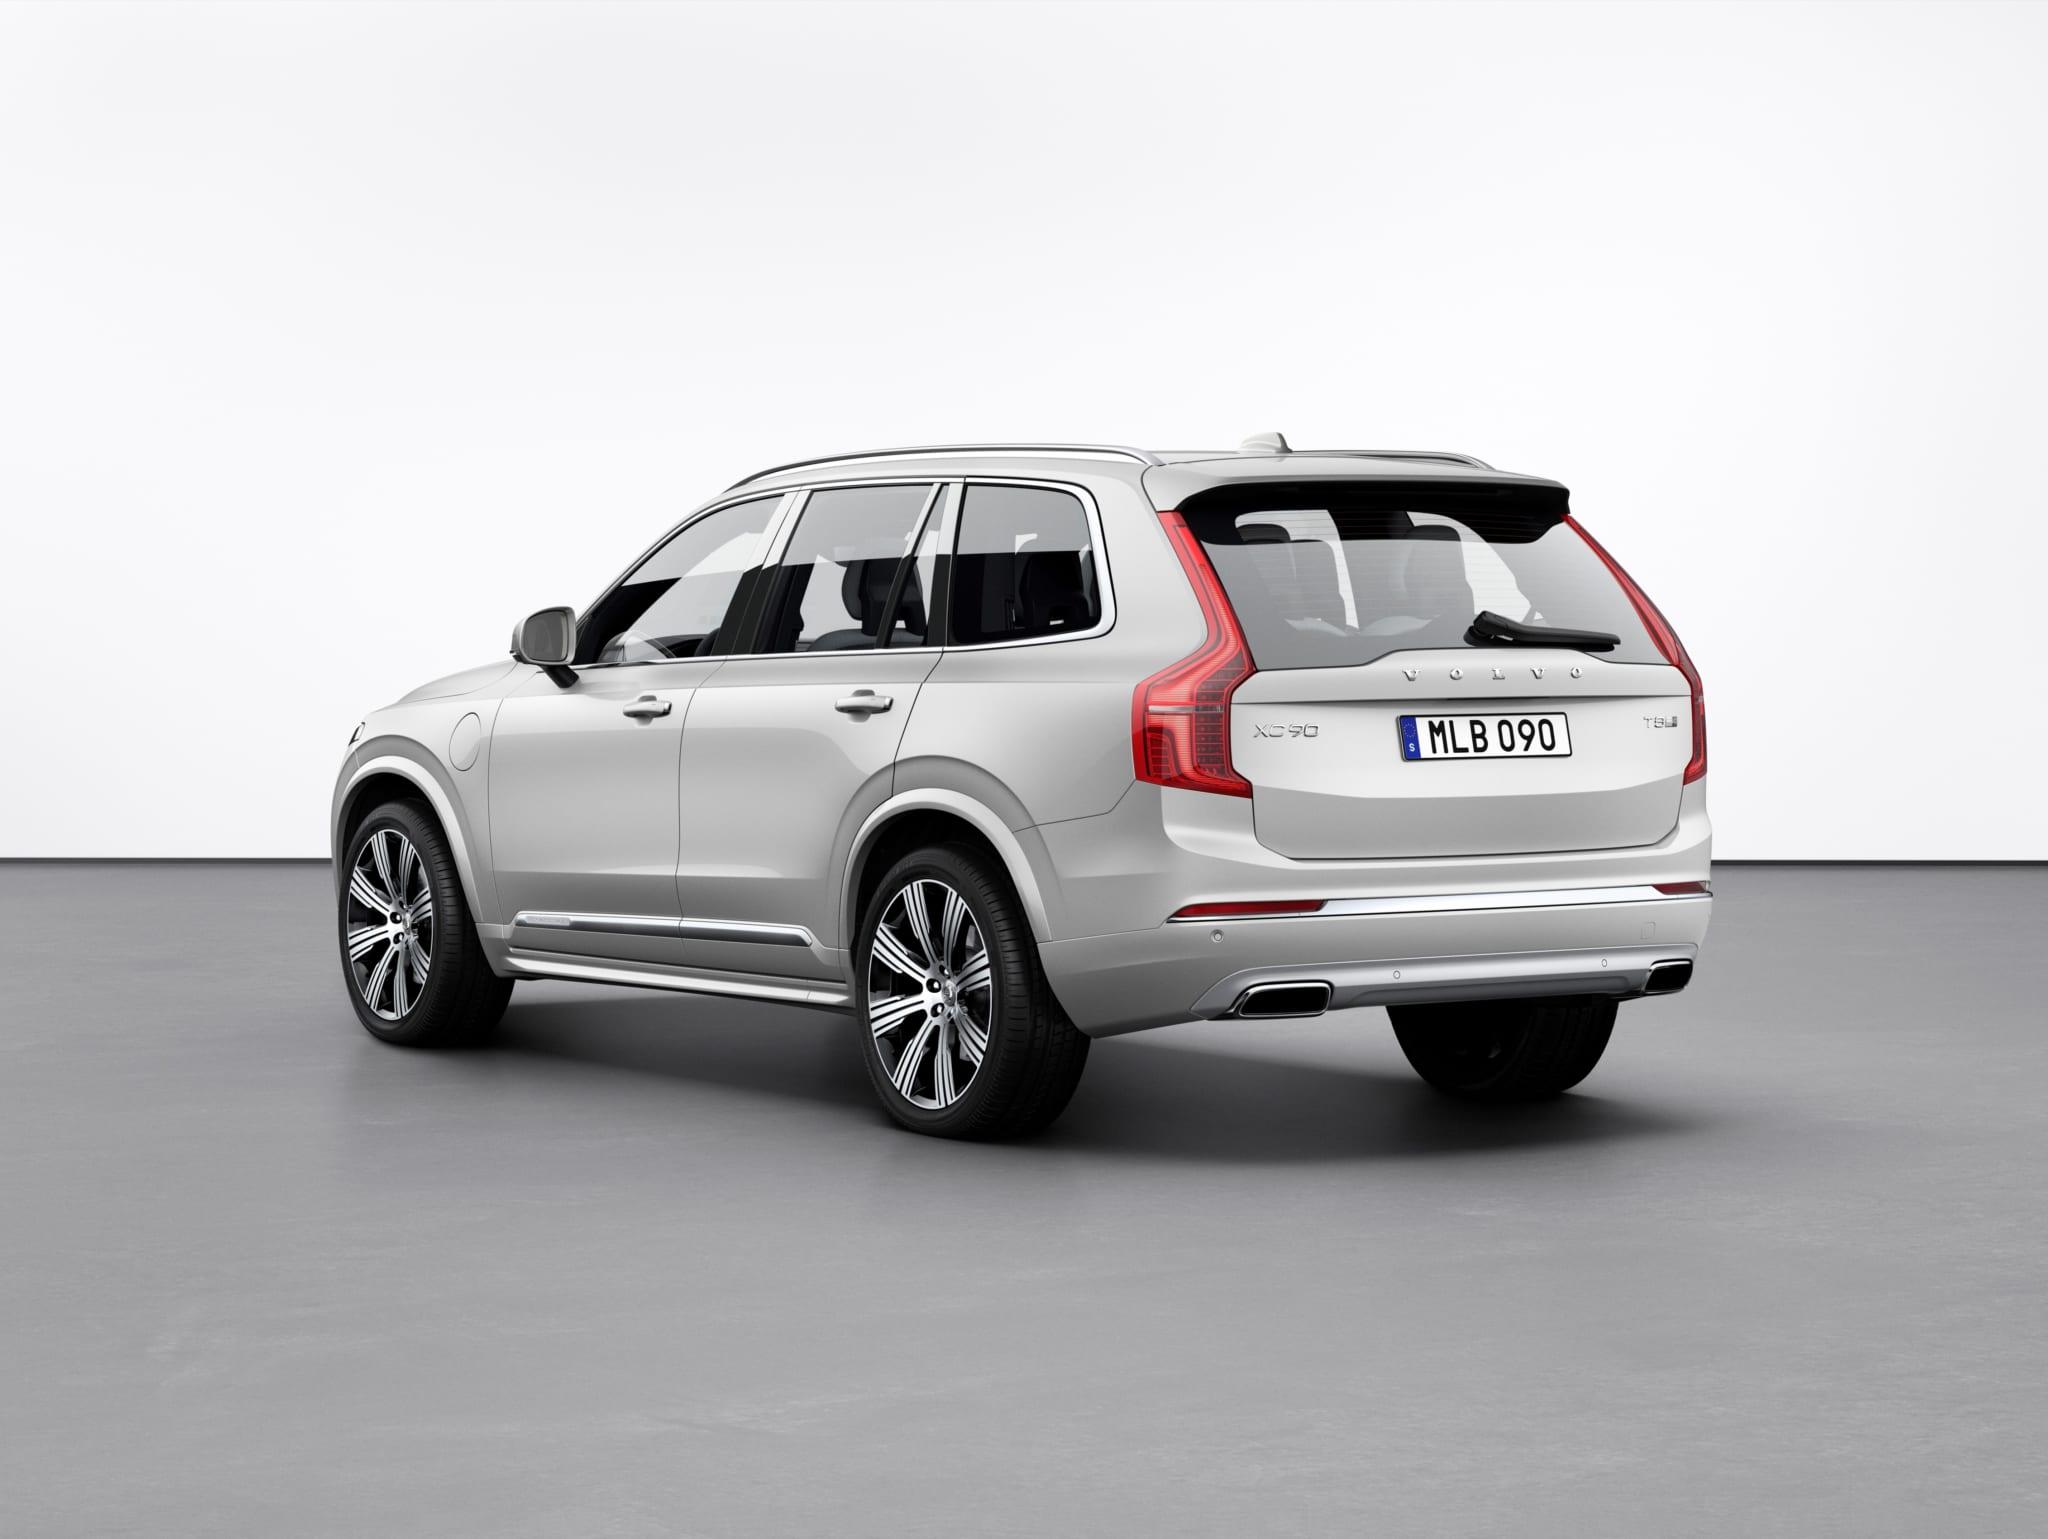 Volvo_XC90_LB420XC_rear_side